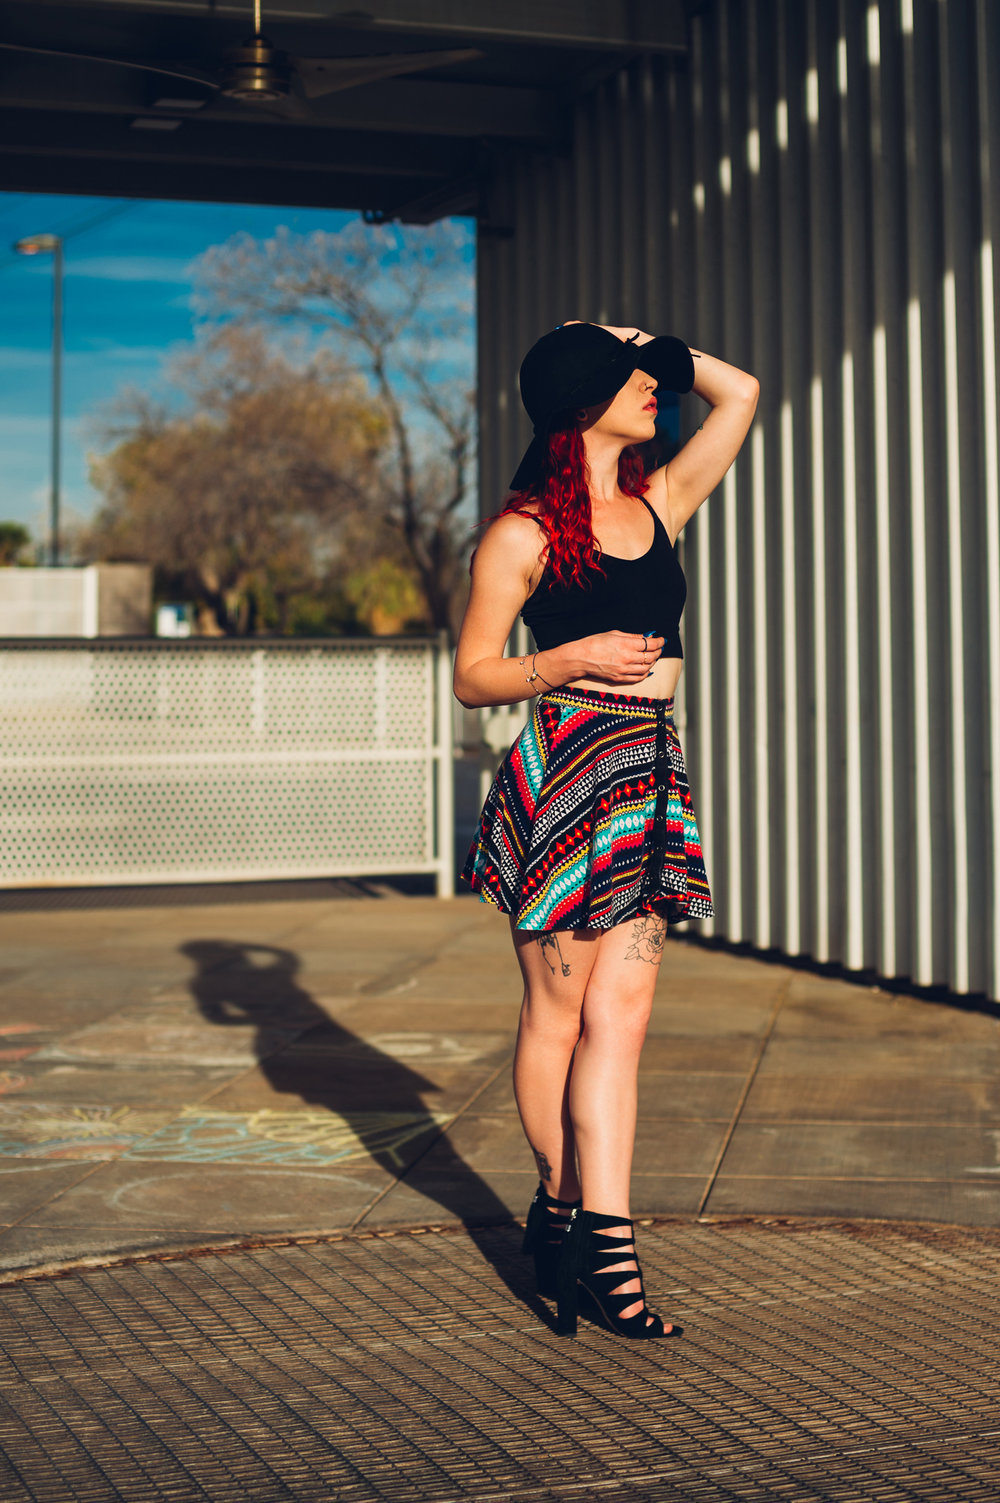 Courtney_AZFalls-19.jpg